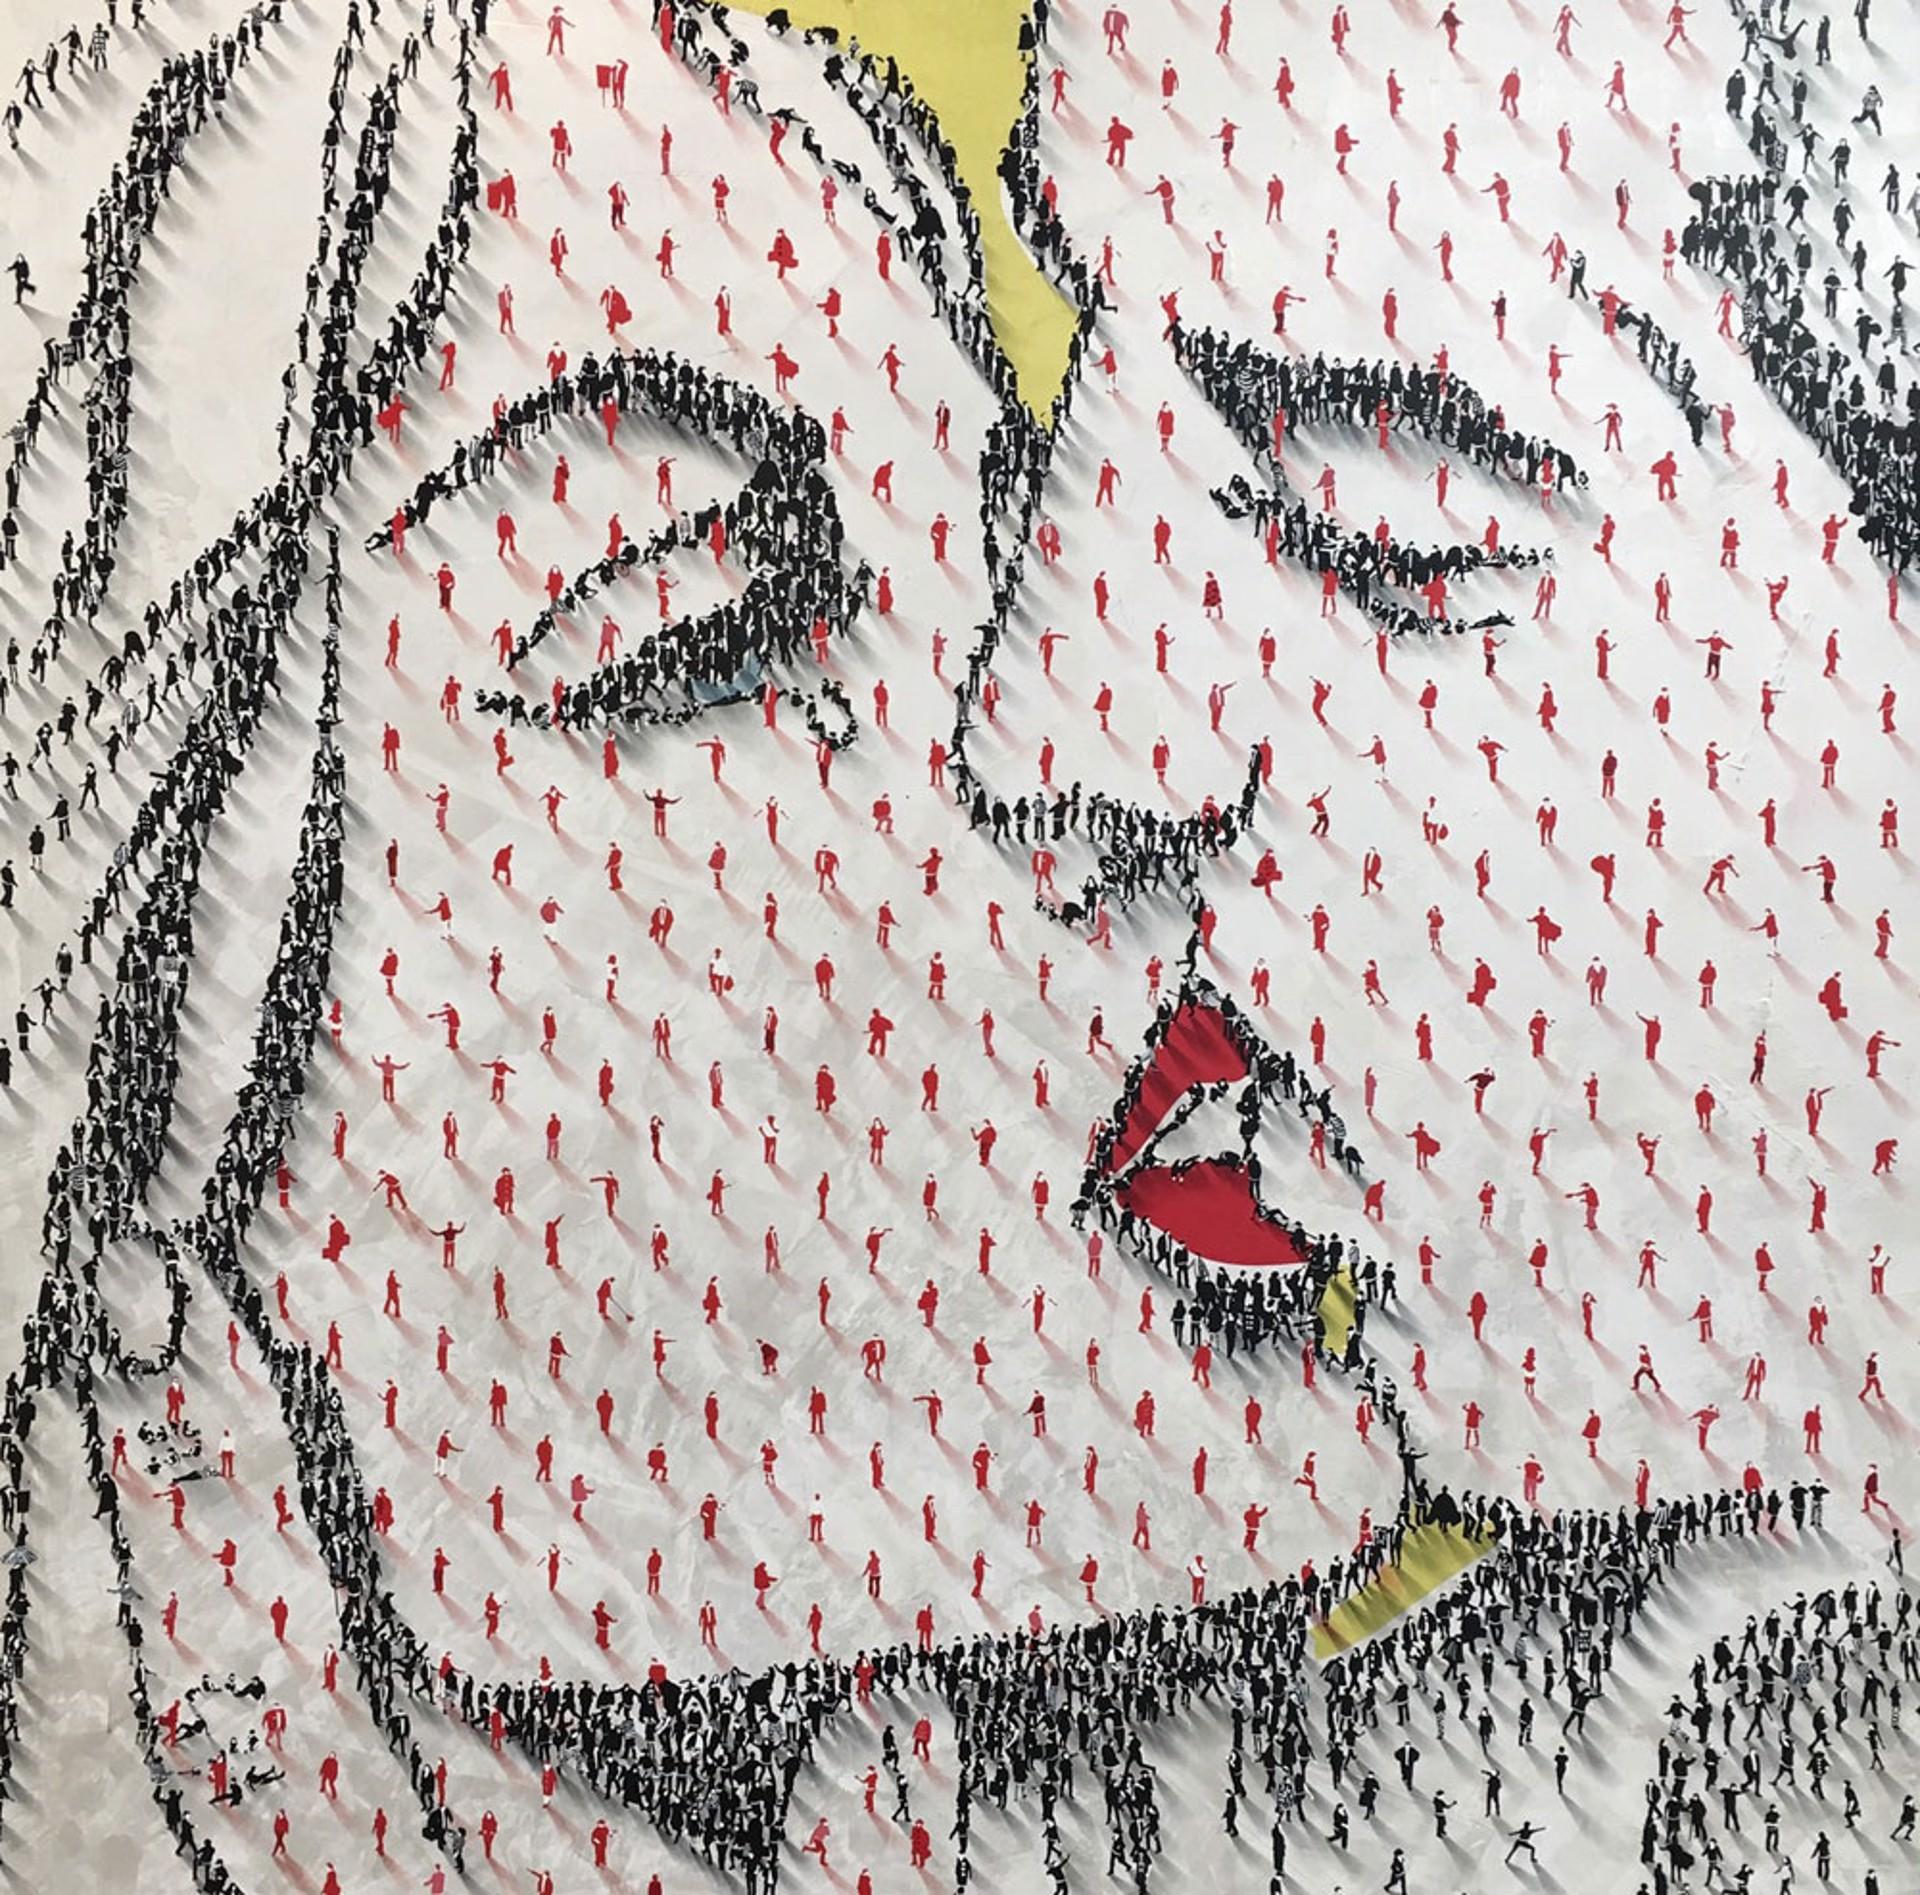 Last Kiss Goodnight by Craig Alan, Populus Homage